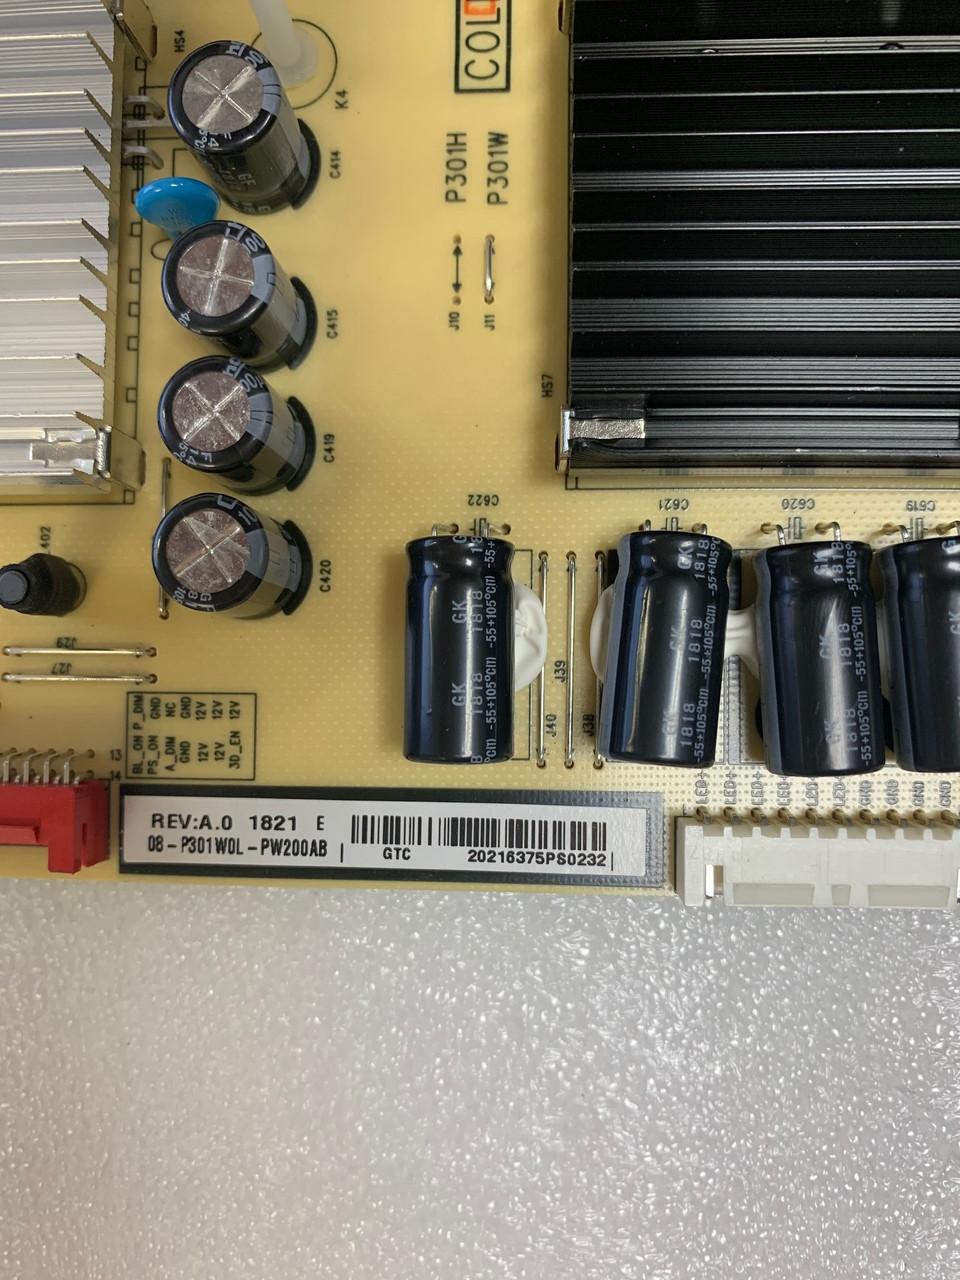 TCL 65R617 Power Supply board 40-P301HL-PWA1CG / 06-P301W0L-PW200AB